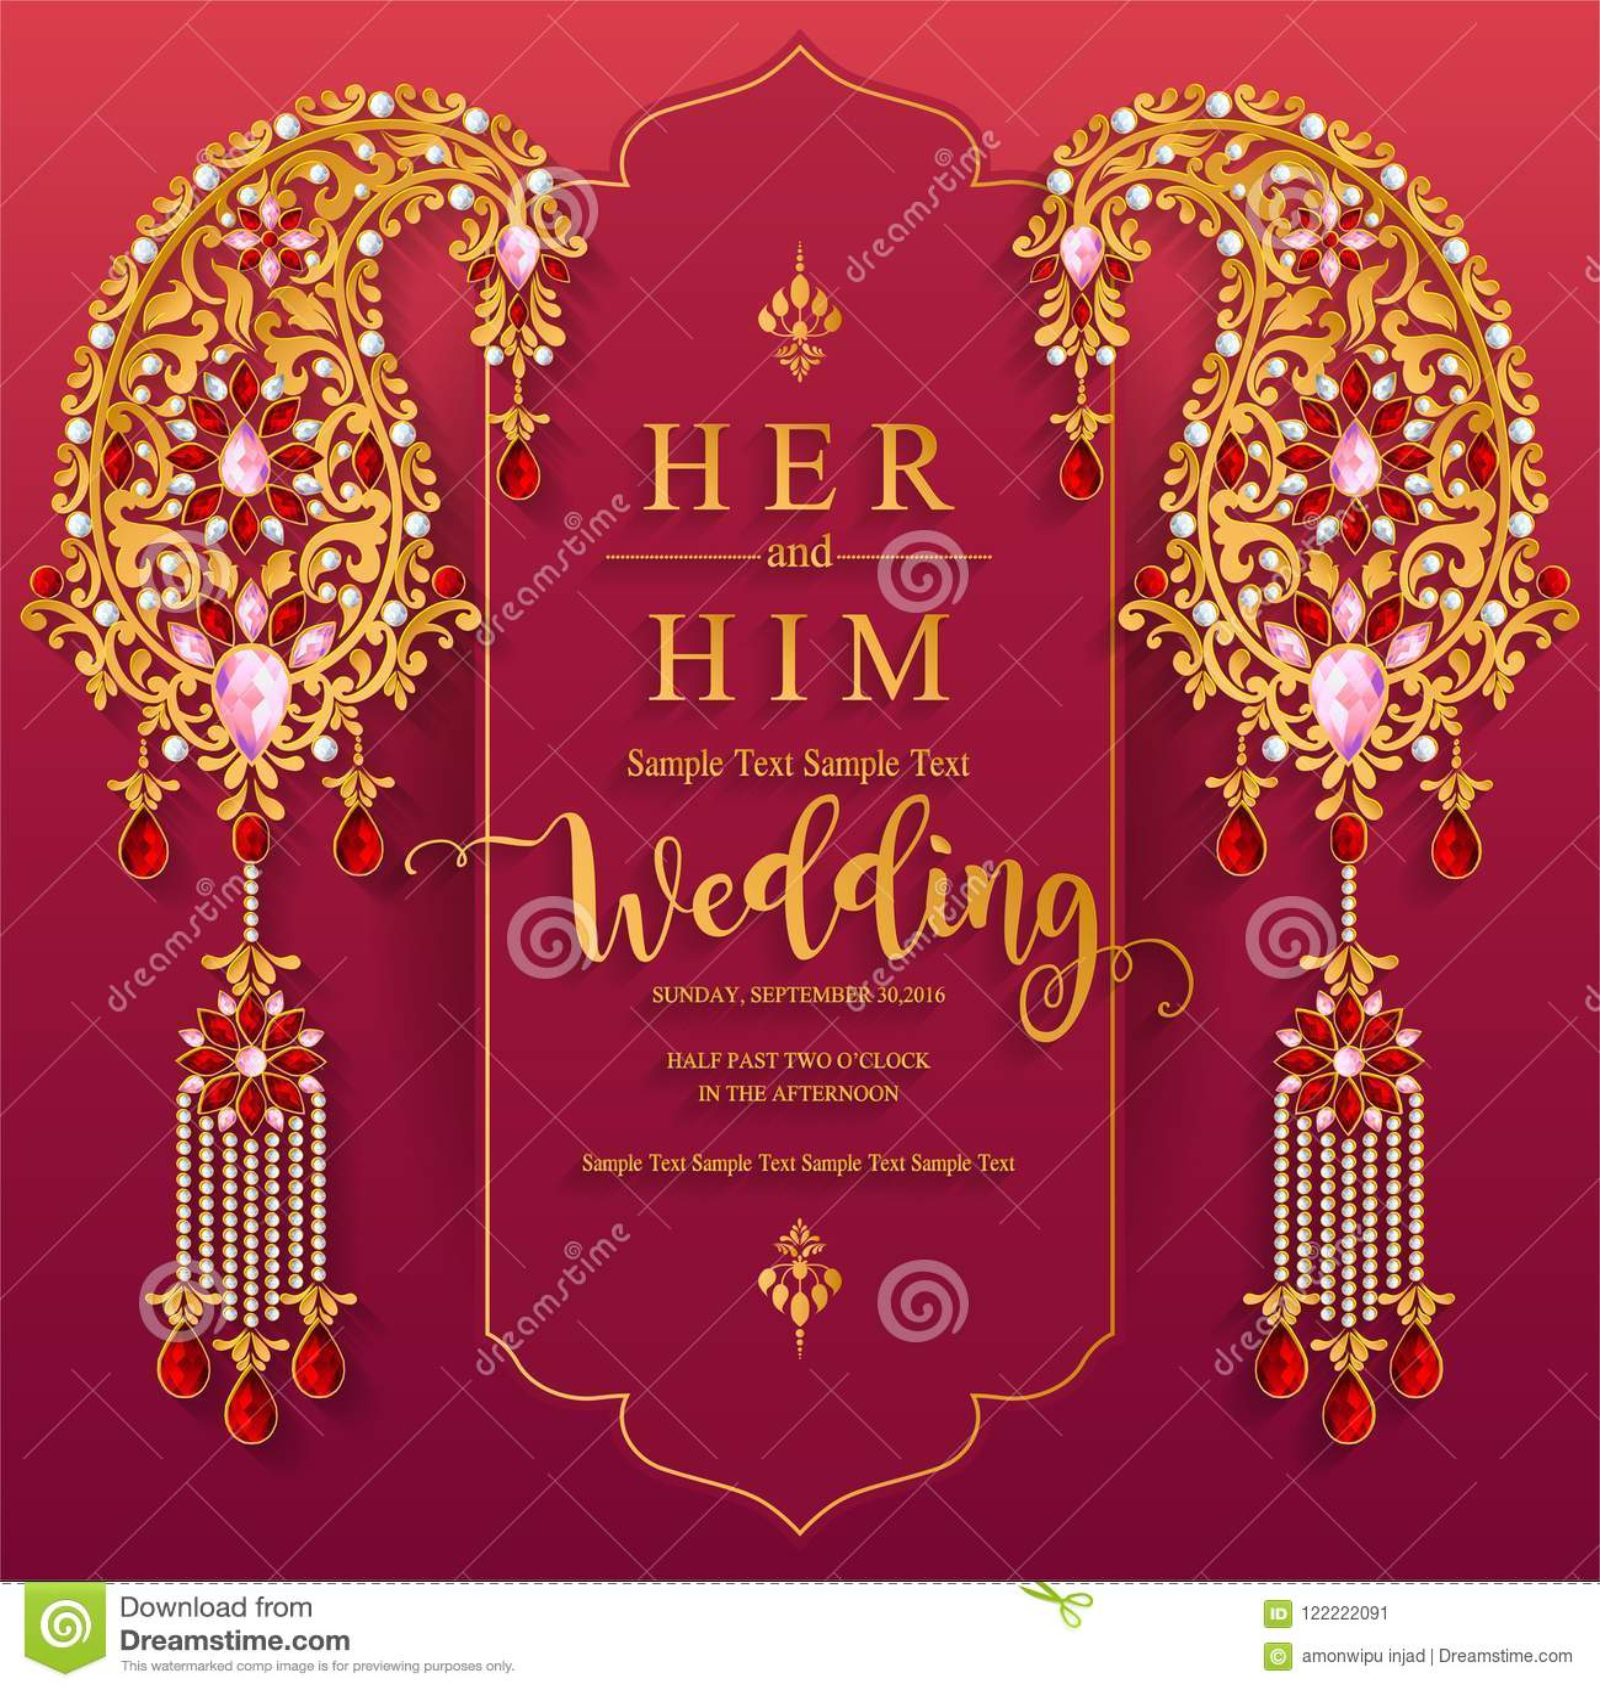 Wedding Invitation Card Templates . Stock Vector - Illustration of ...